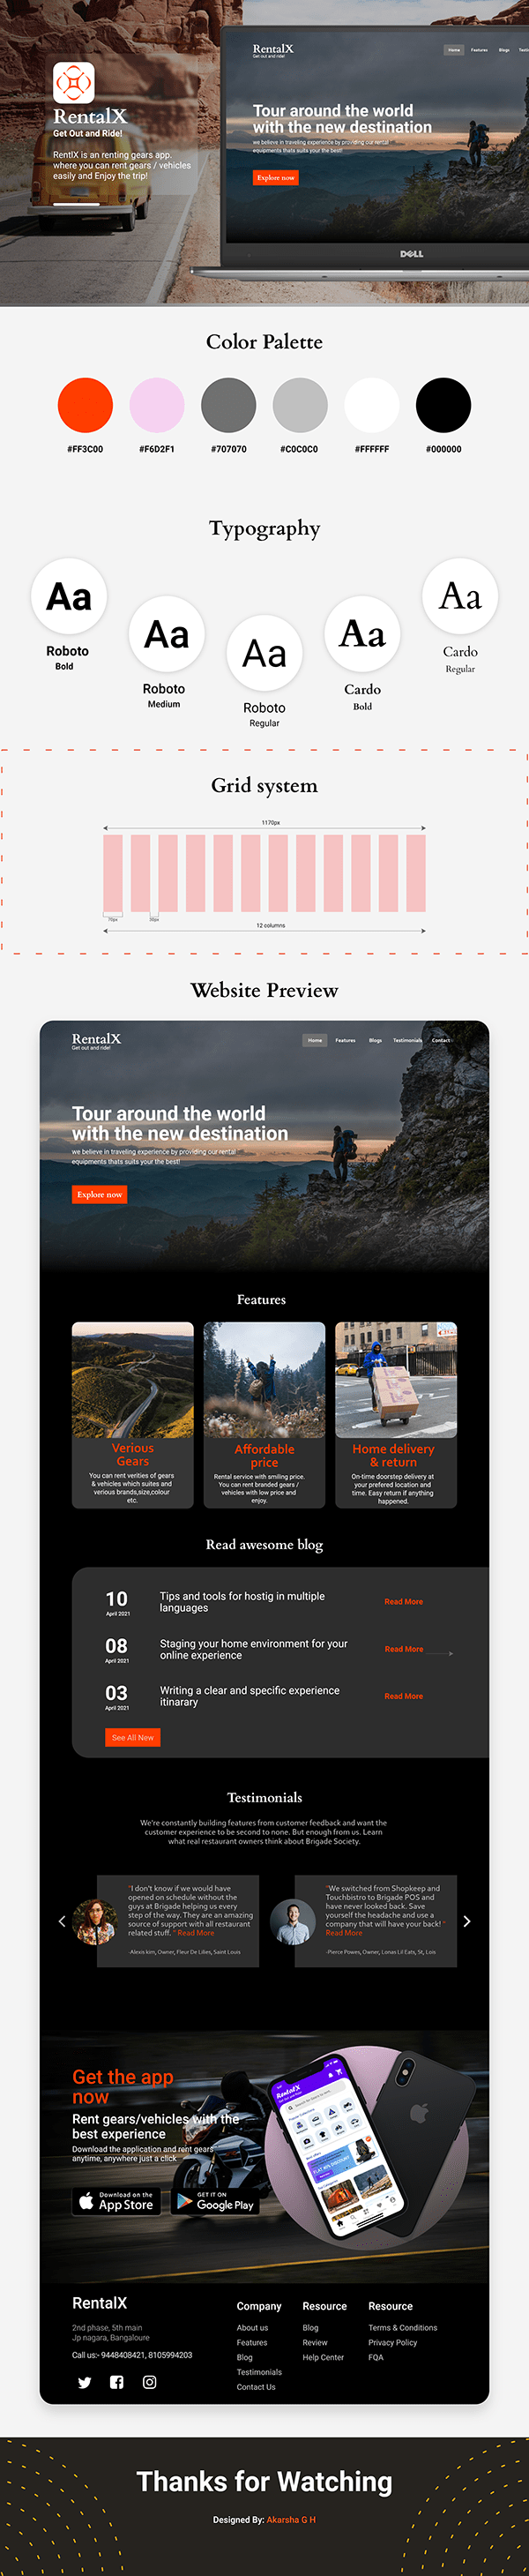 Website presentation - RentalX